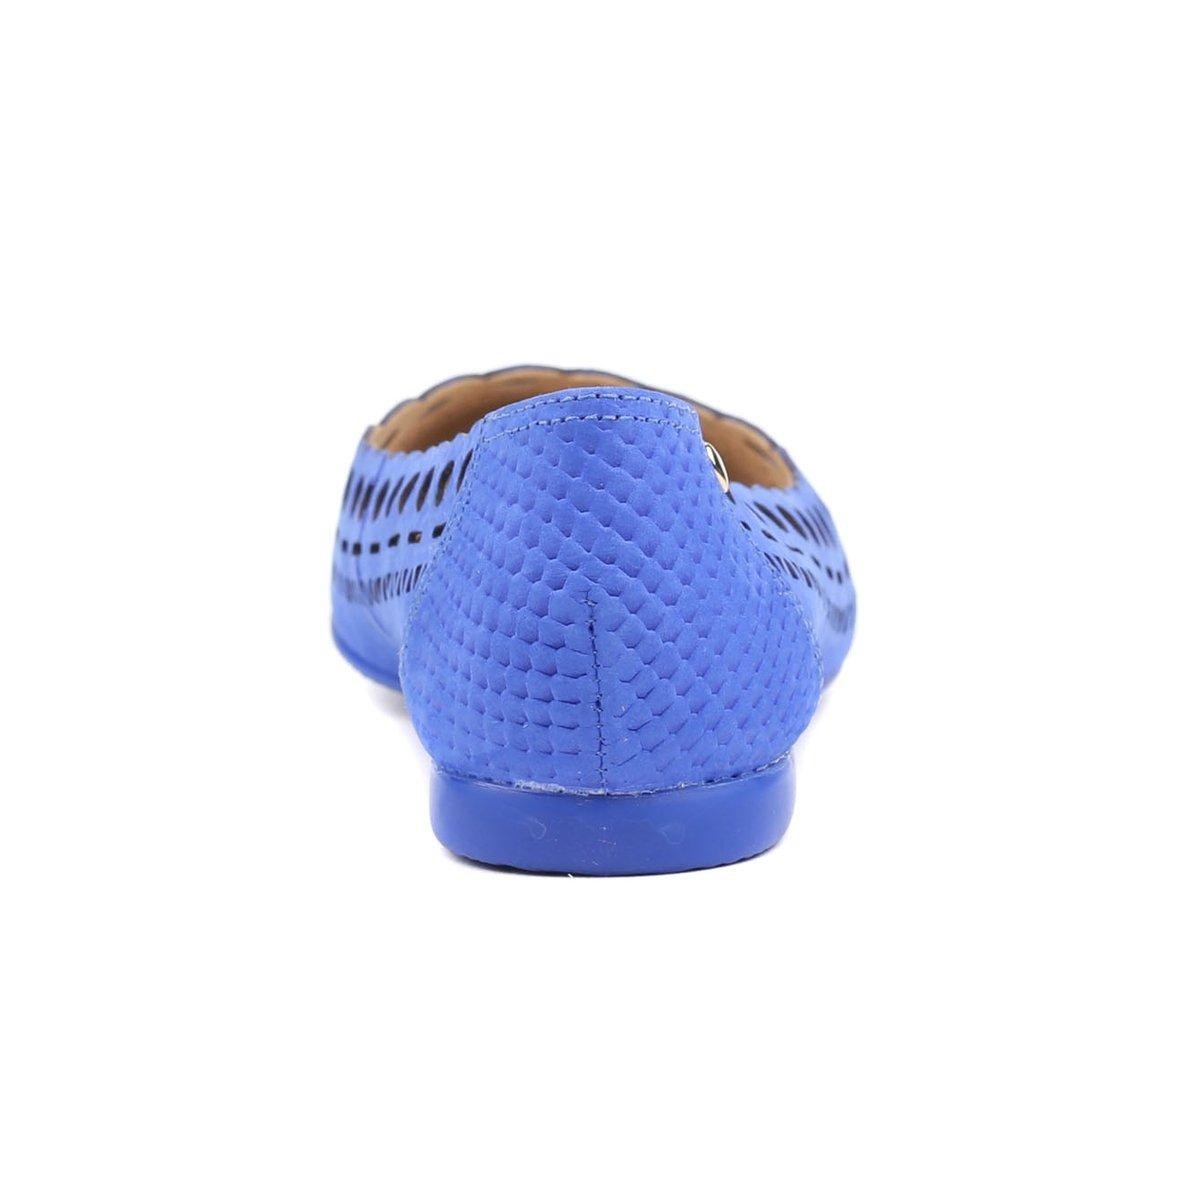 Sapatilha Feminina Feminina Bottero Bottero Azul Azul Sapatilha Mari OtwxqxFUv5